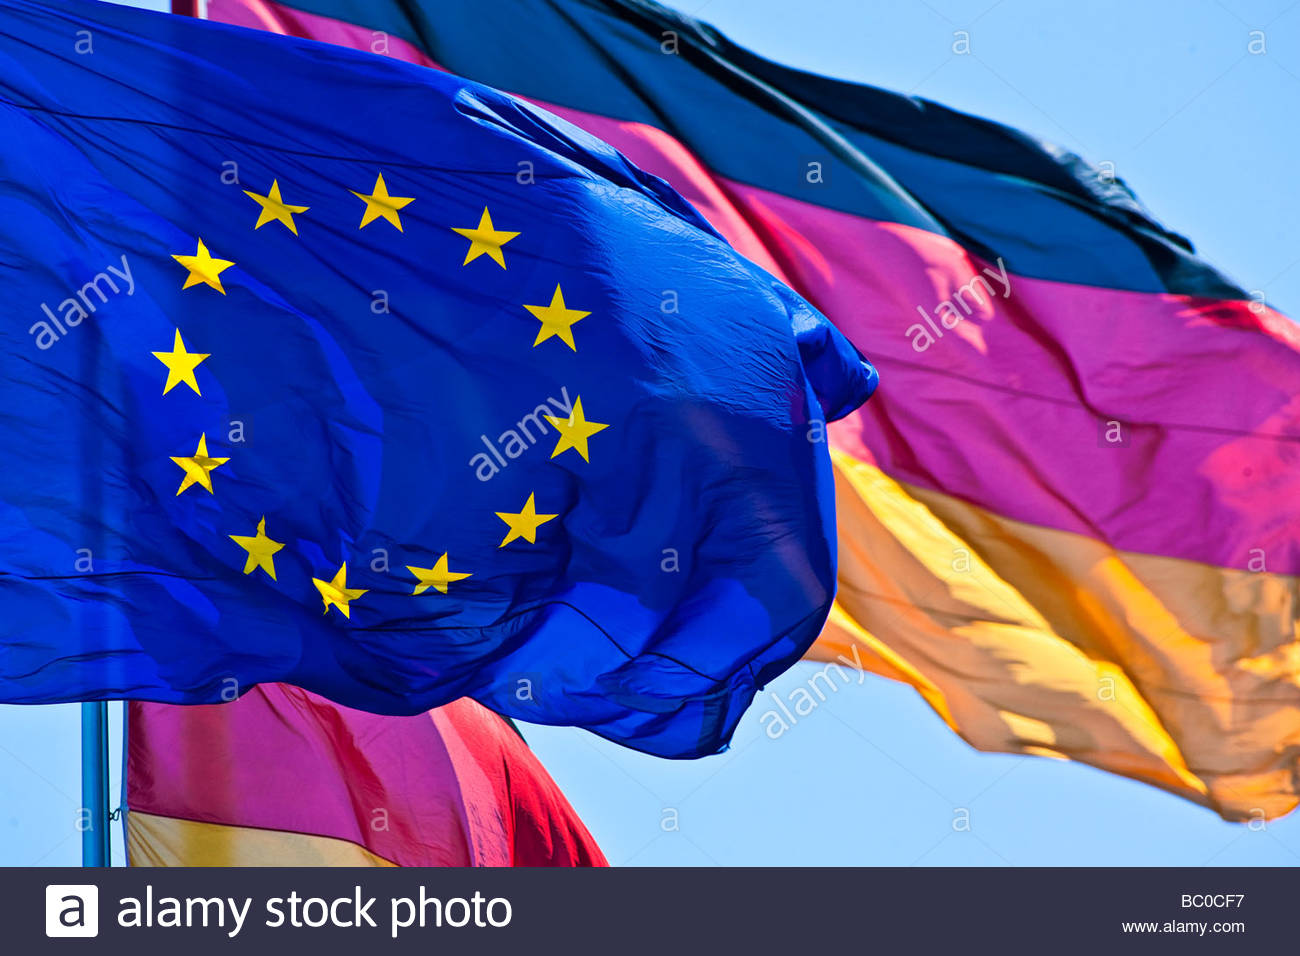 german and european flag - Stock Image